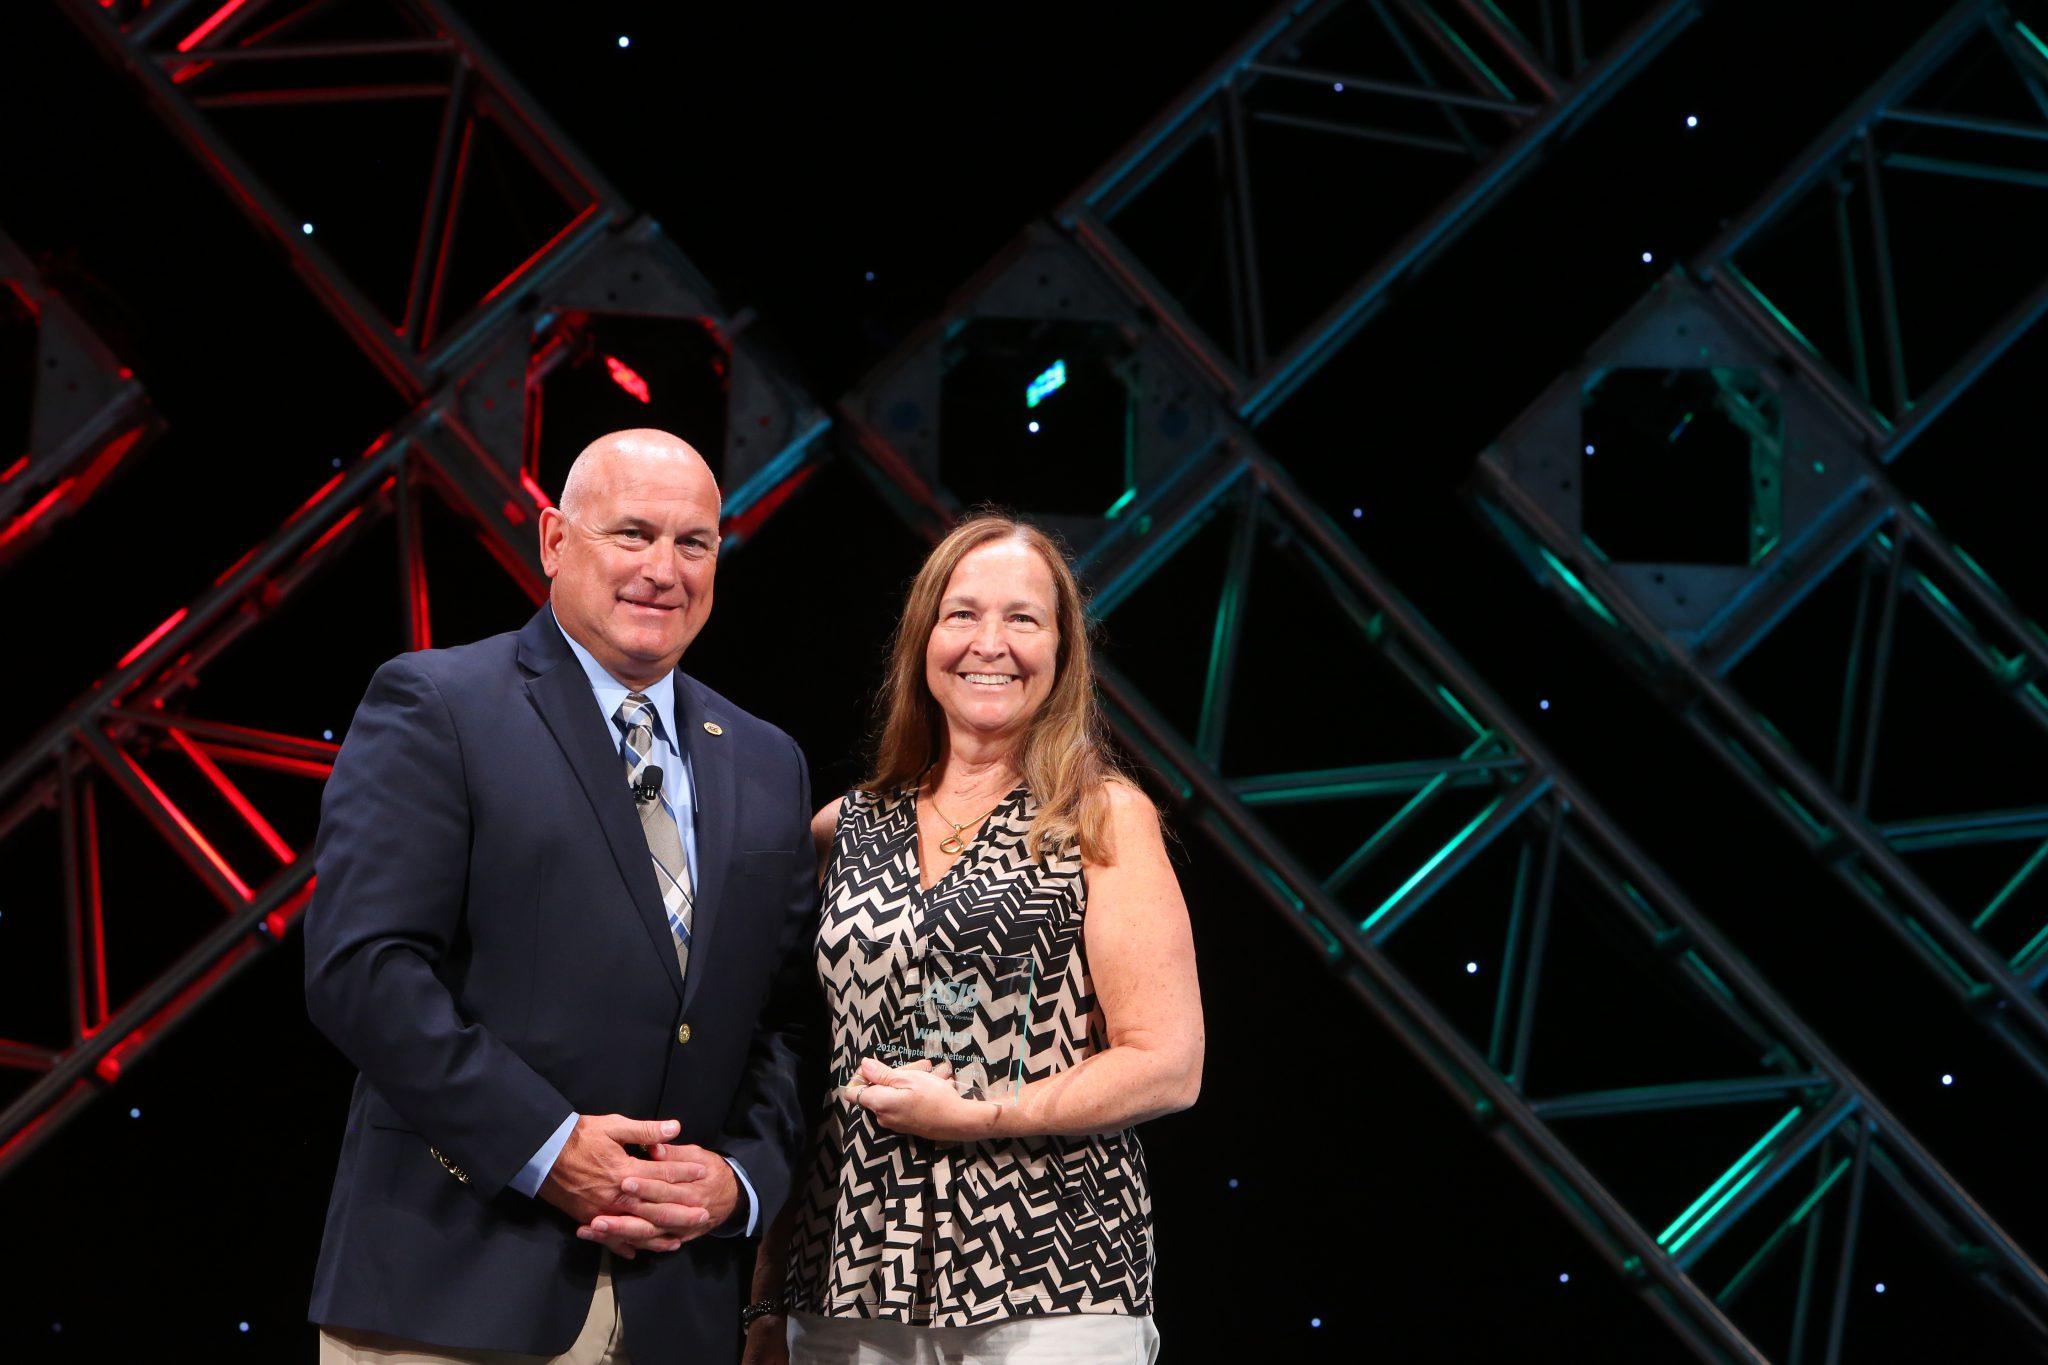 Award Group 6: Columbus Chapter 2018 Chapter Newsletter of the Year Winner